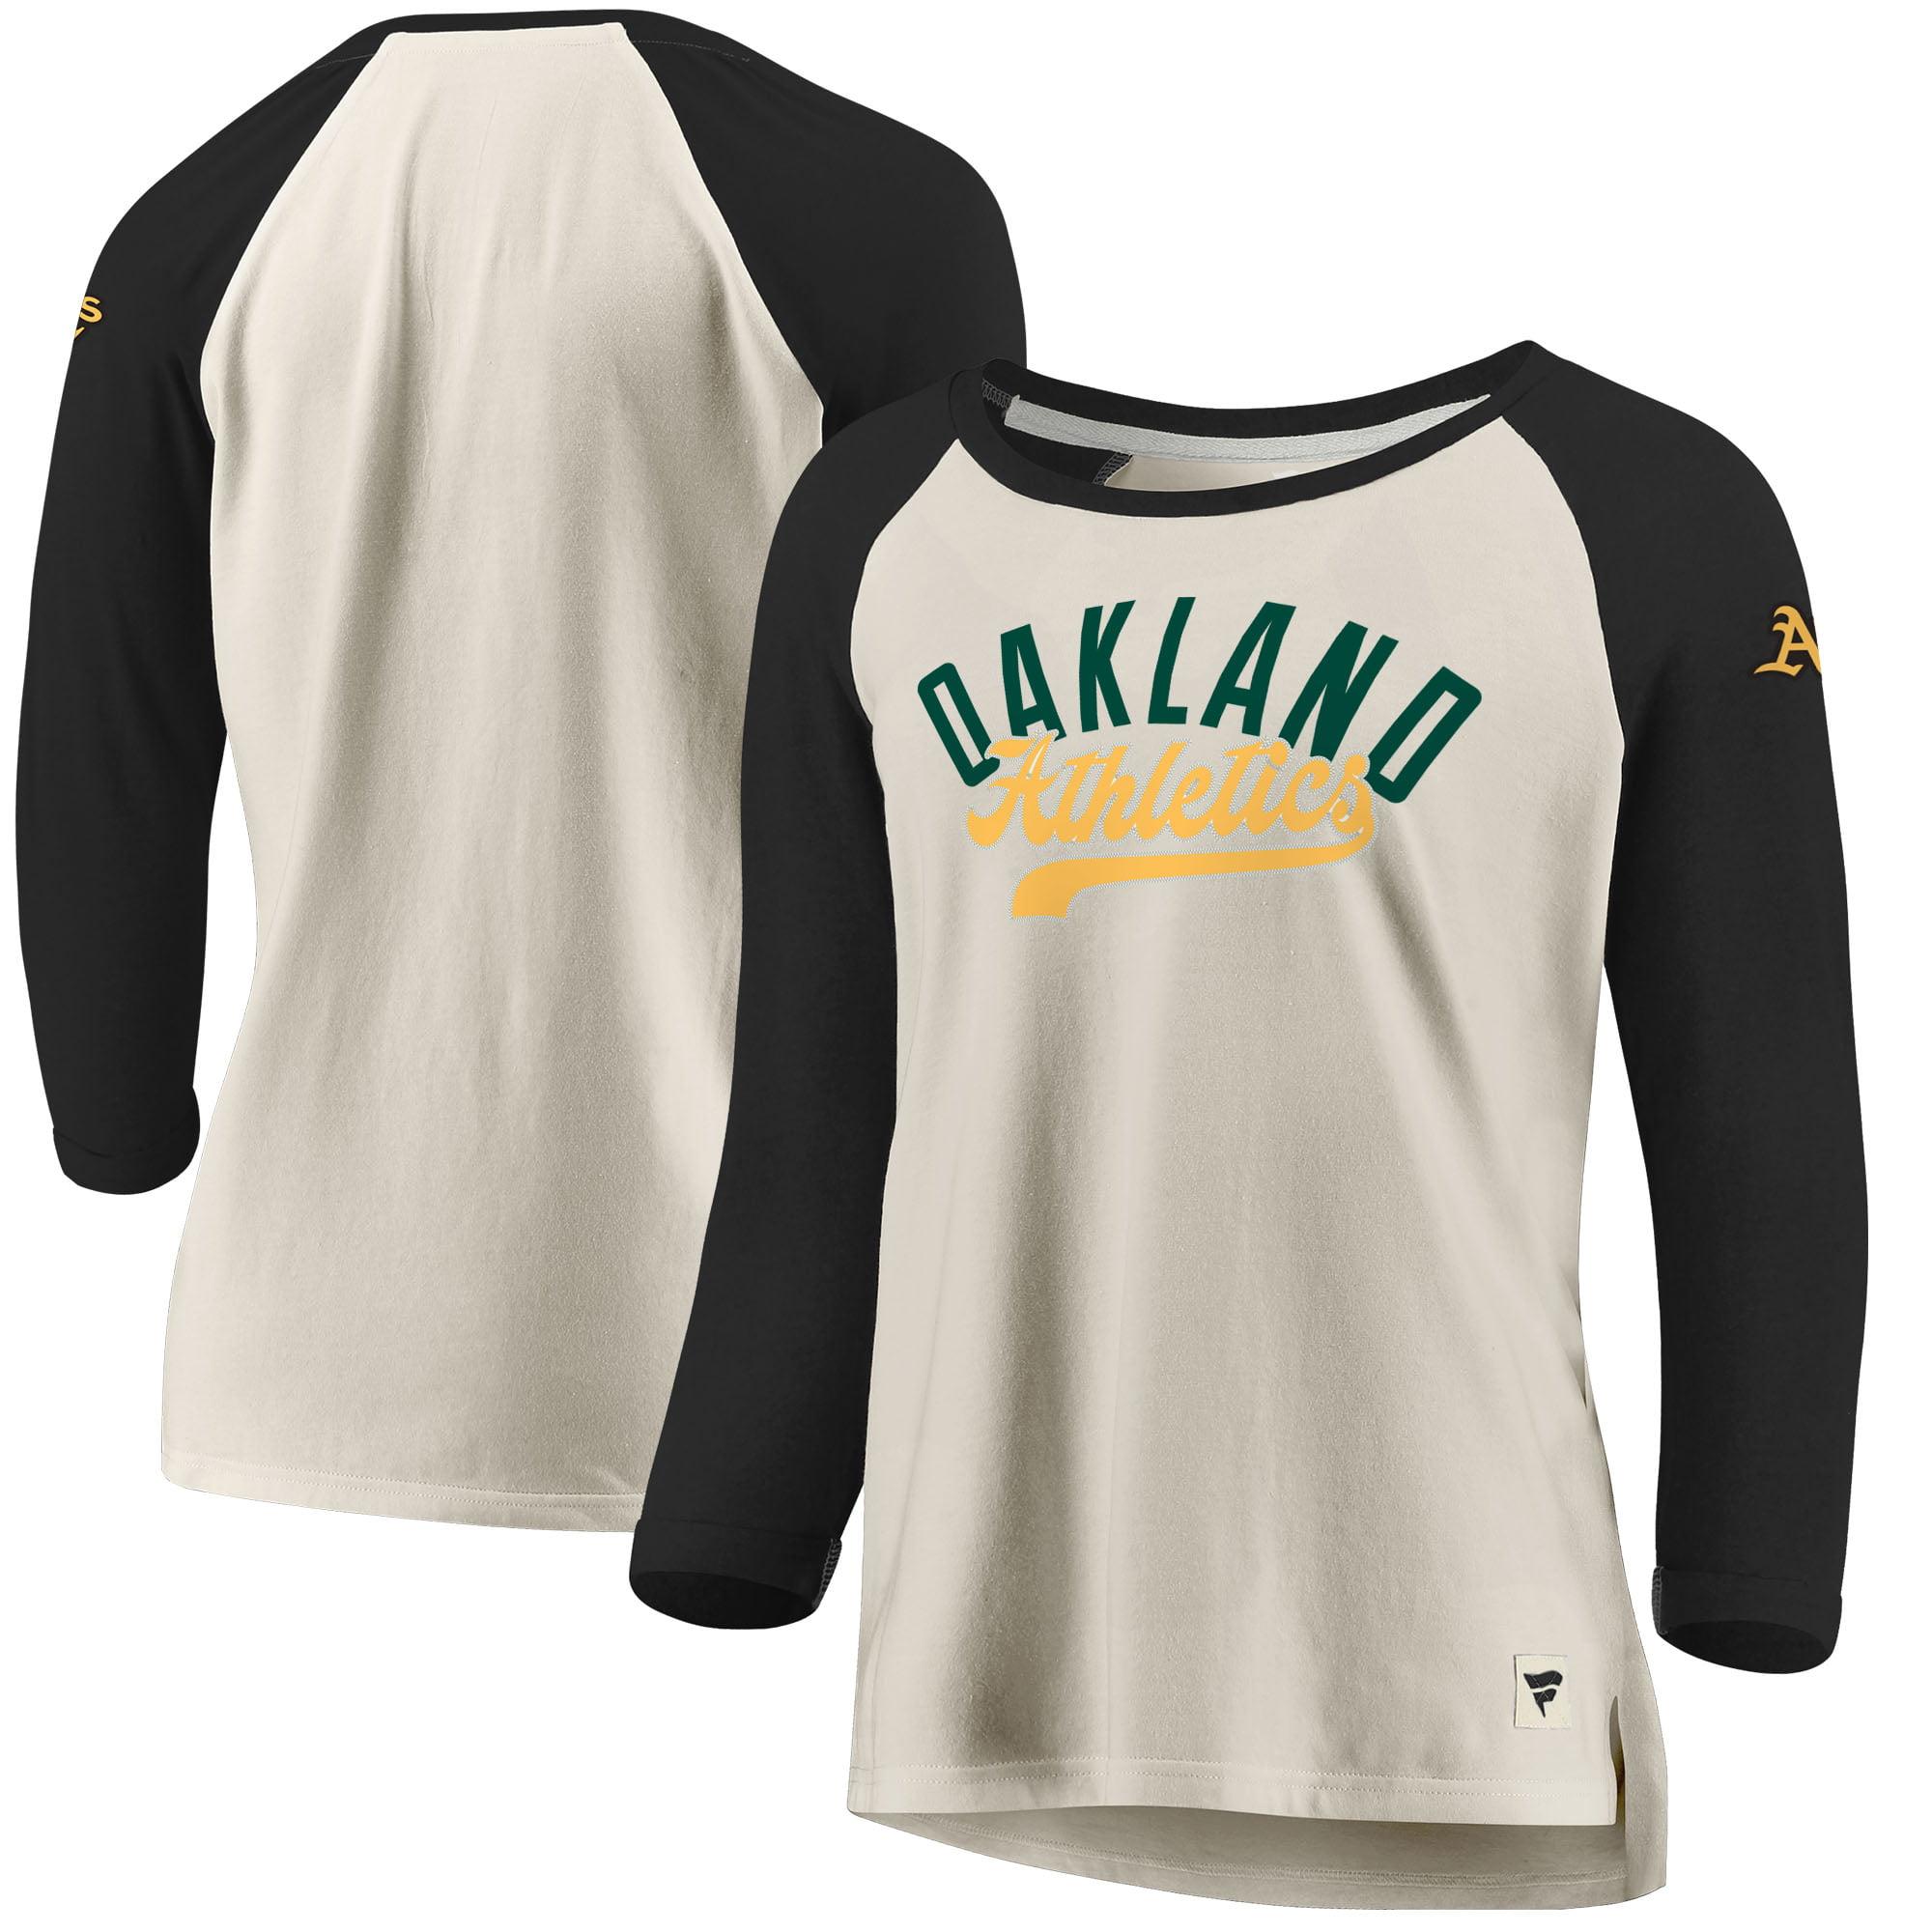 Oakland Athletics Fanatics Branded Women's Heritage Open Raglan Tri-Blend 3/4-Sleeve T-Shirt - Cream/Black